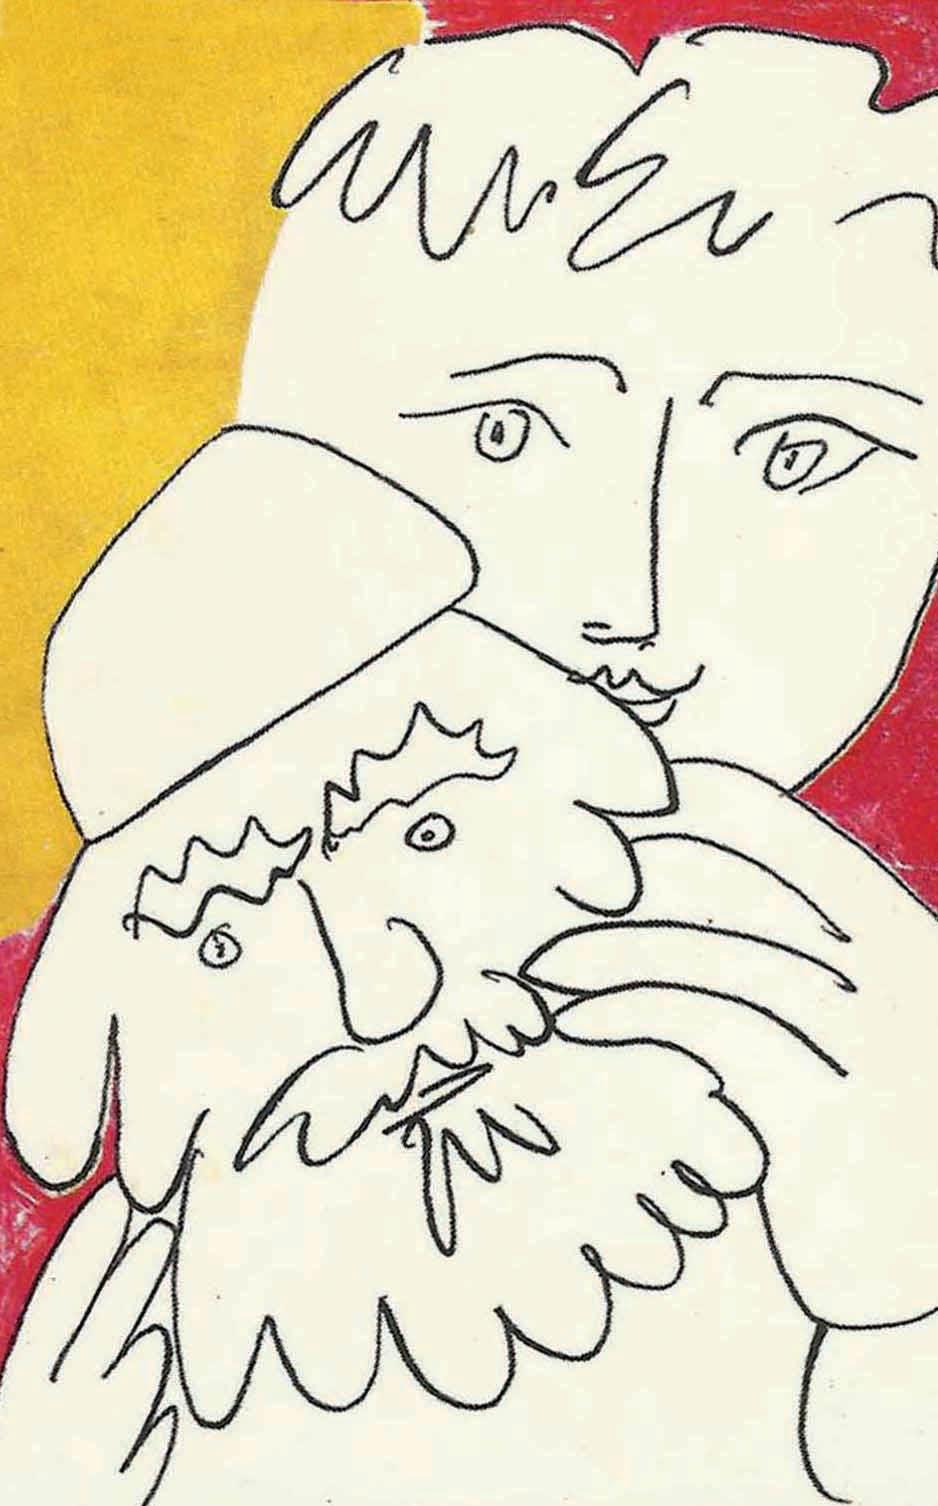 Kristijan Silvestar - međuosobni zapisci i prepisci Vjerana Zuppe